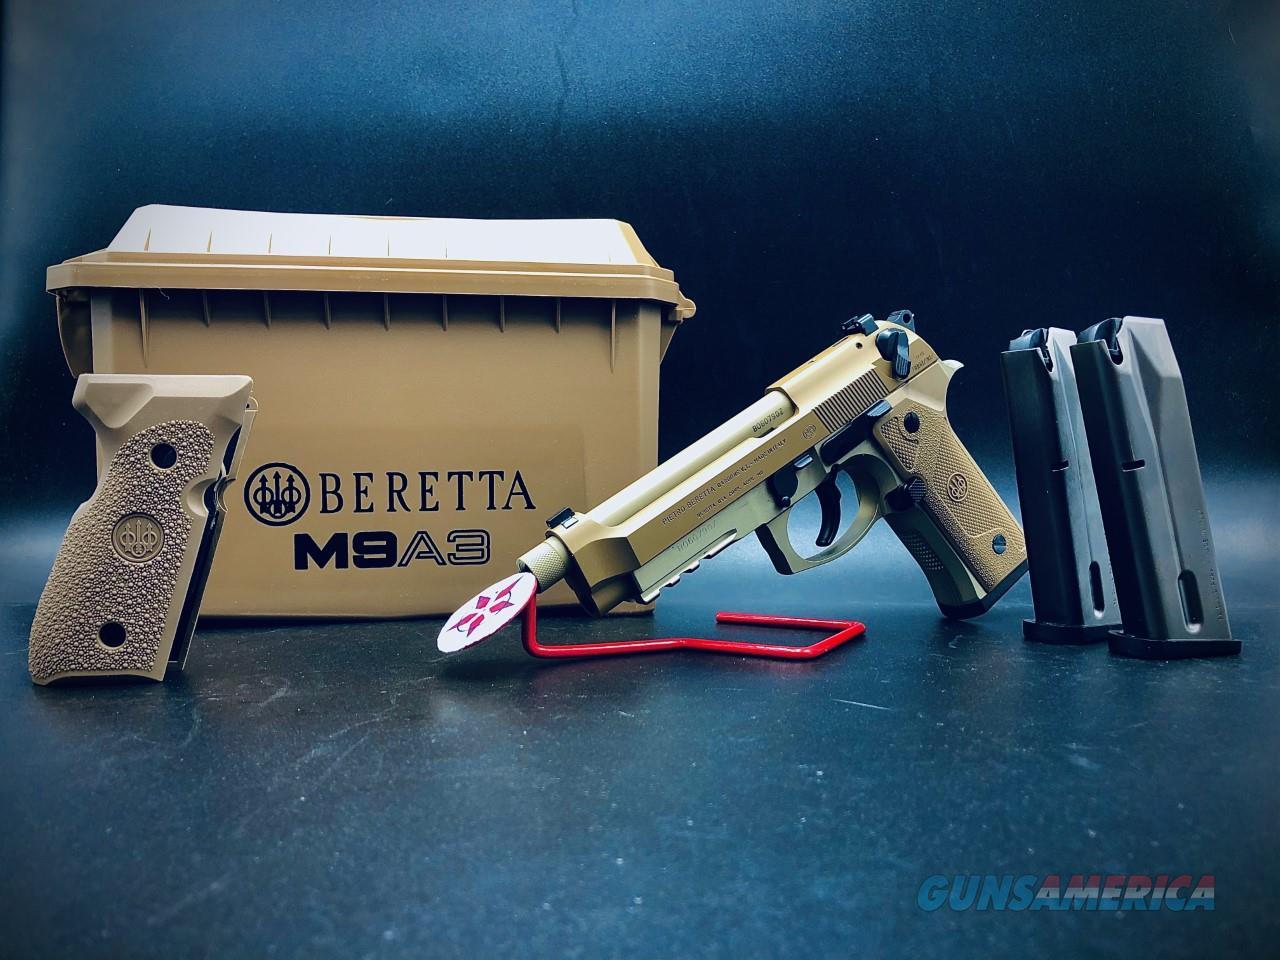 M9A3 FDE CLEARANCE  Guns > Pistols > Beretta Pistols > M9